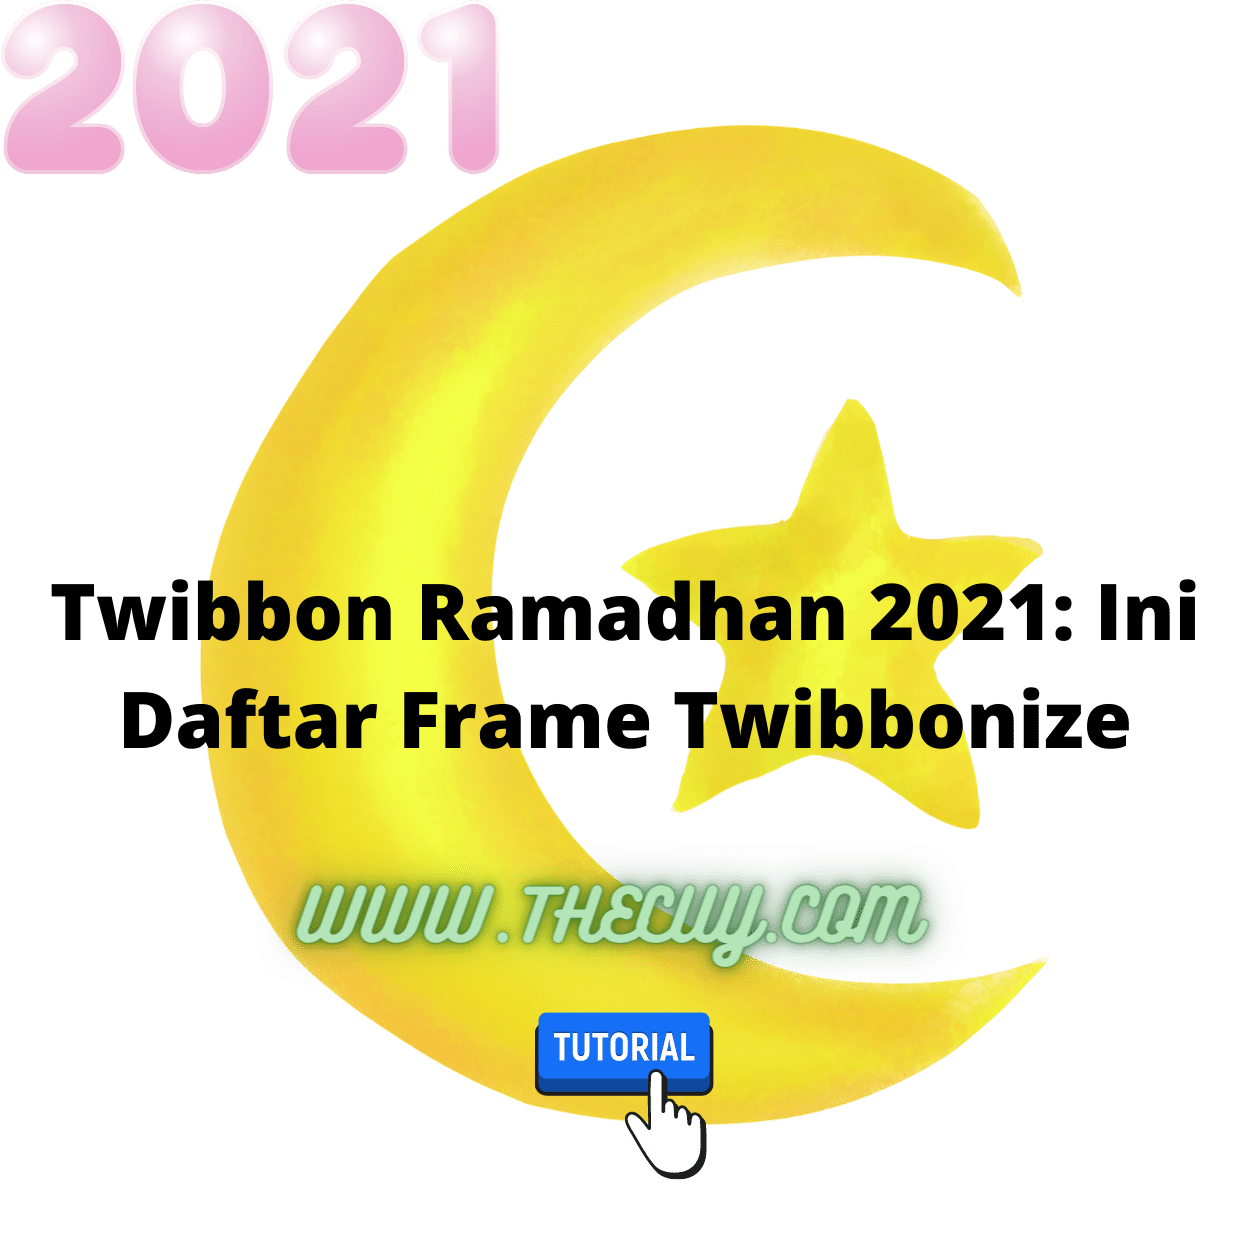 Twibbon Ramadhan 2021: Ini Daftar Frame Twibbonize